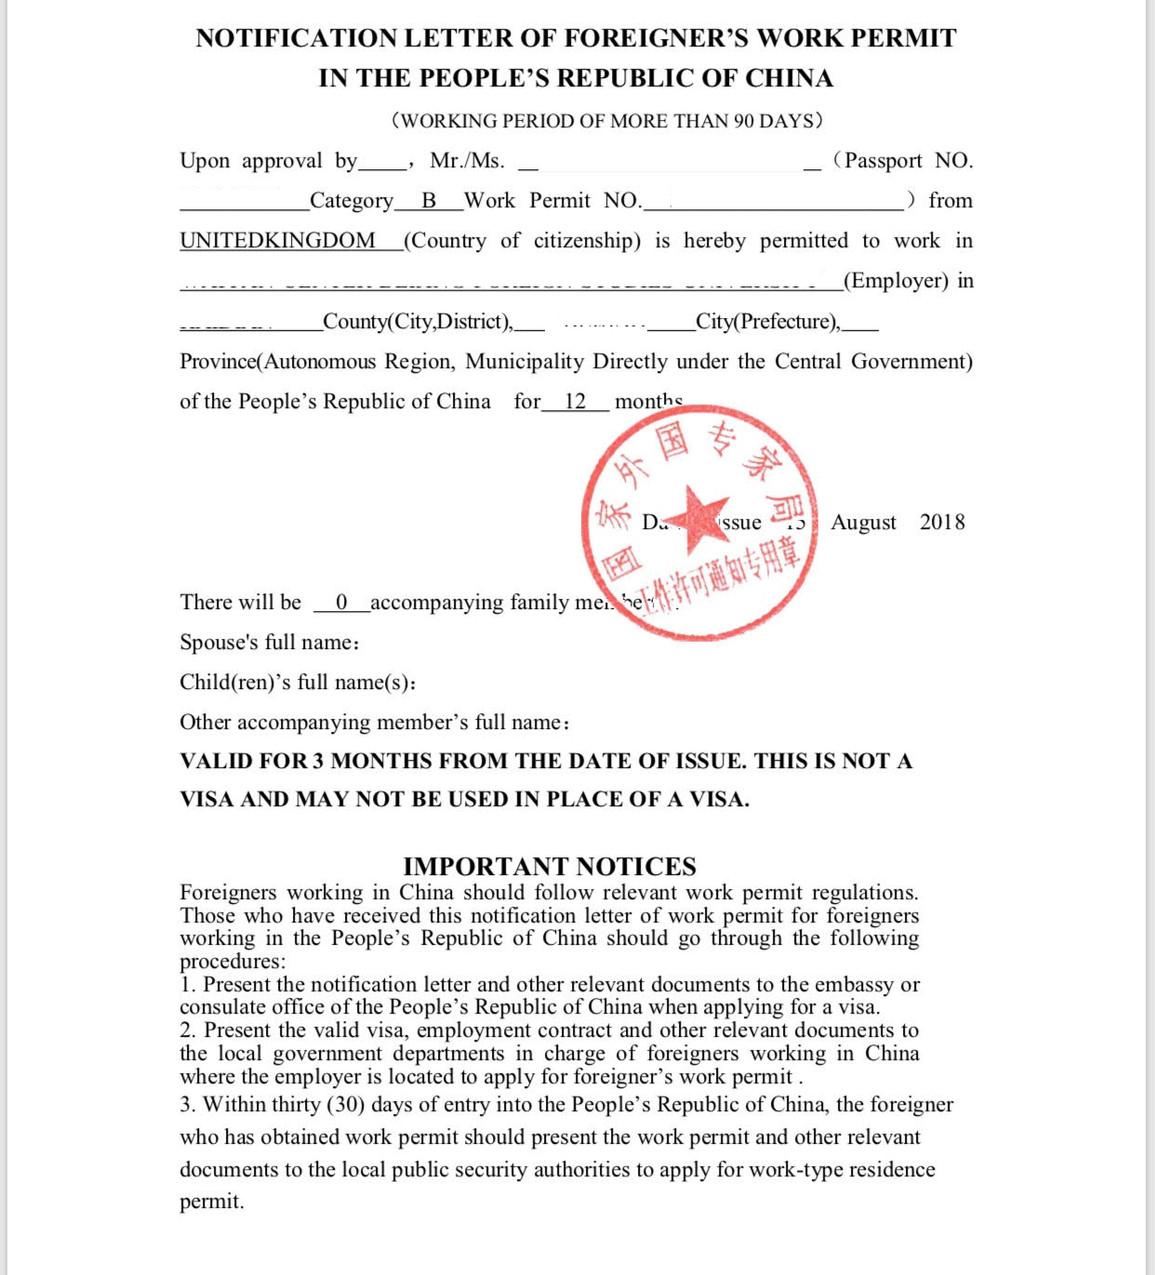 Work Permit in English